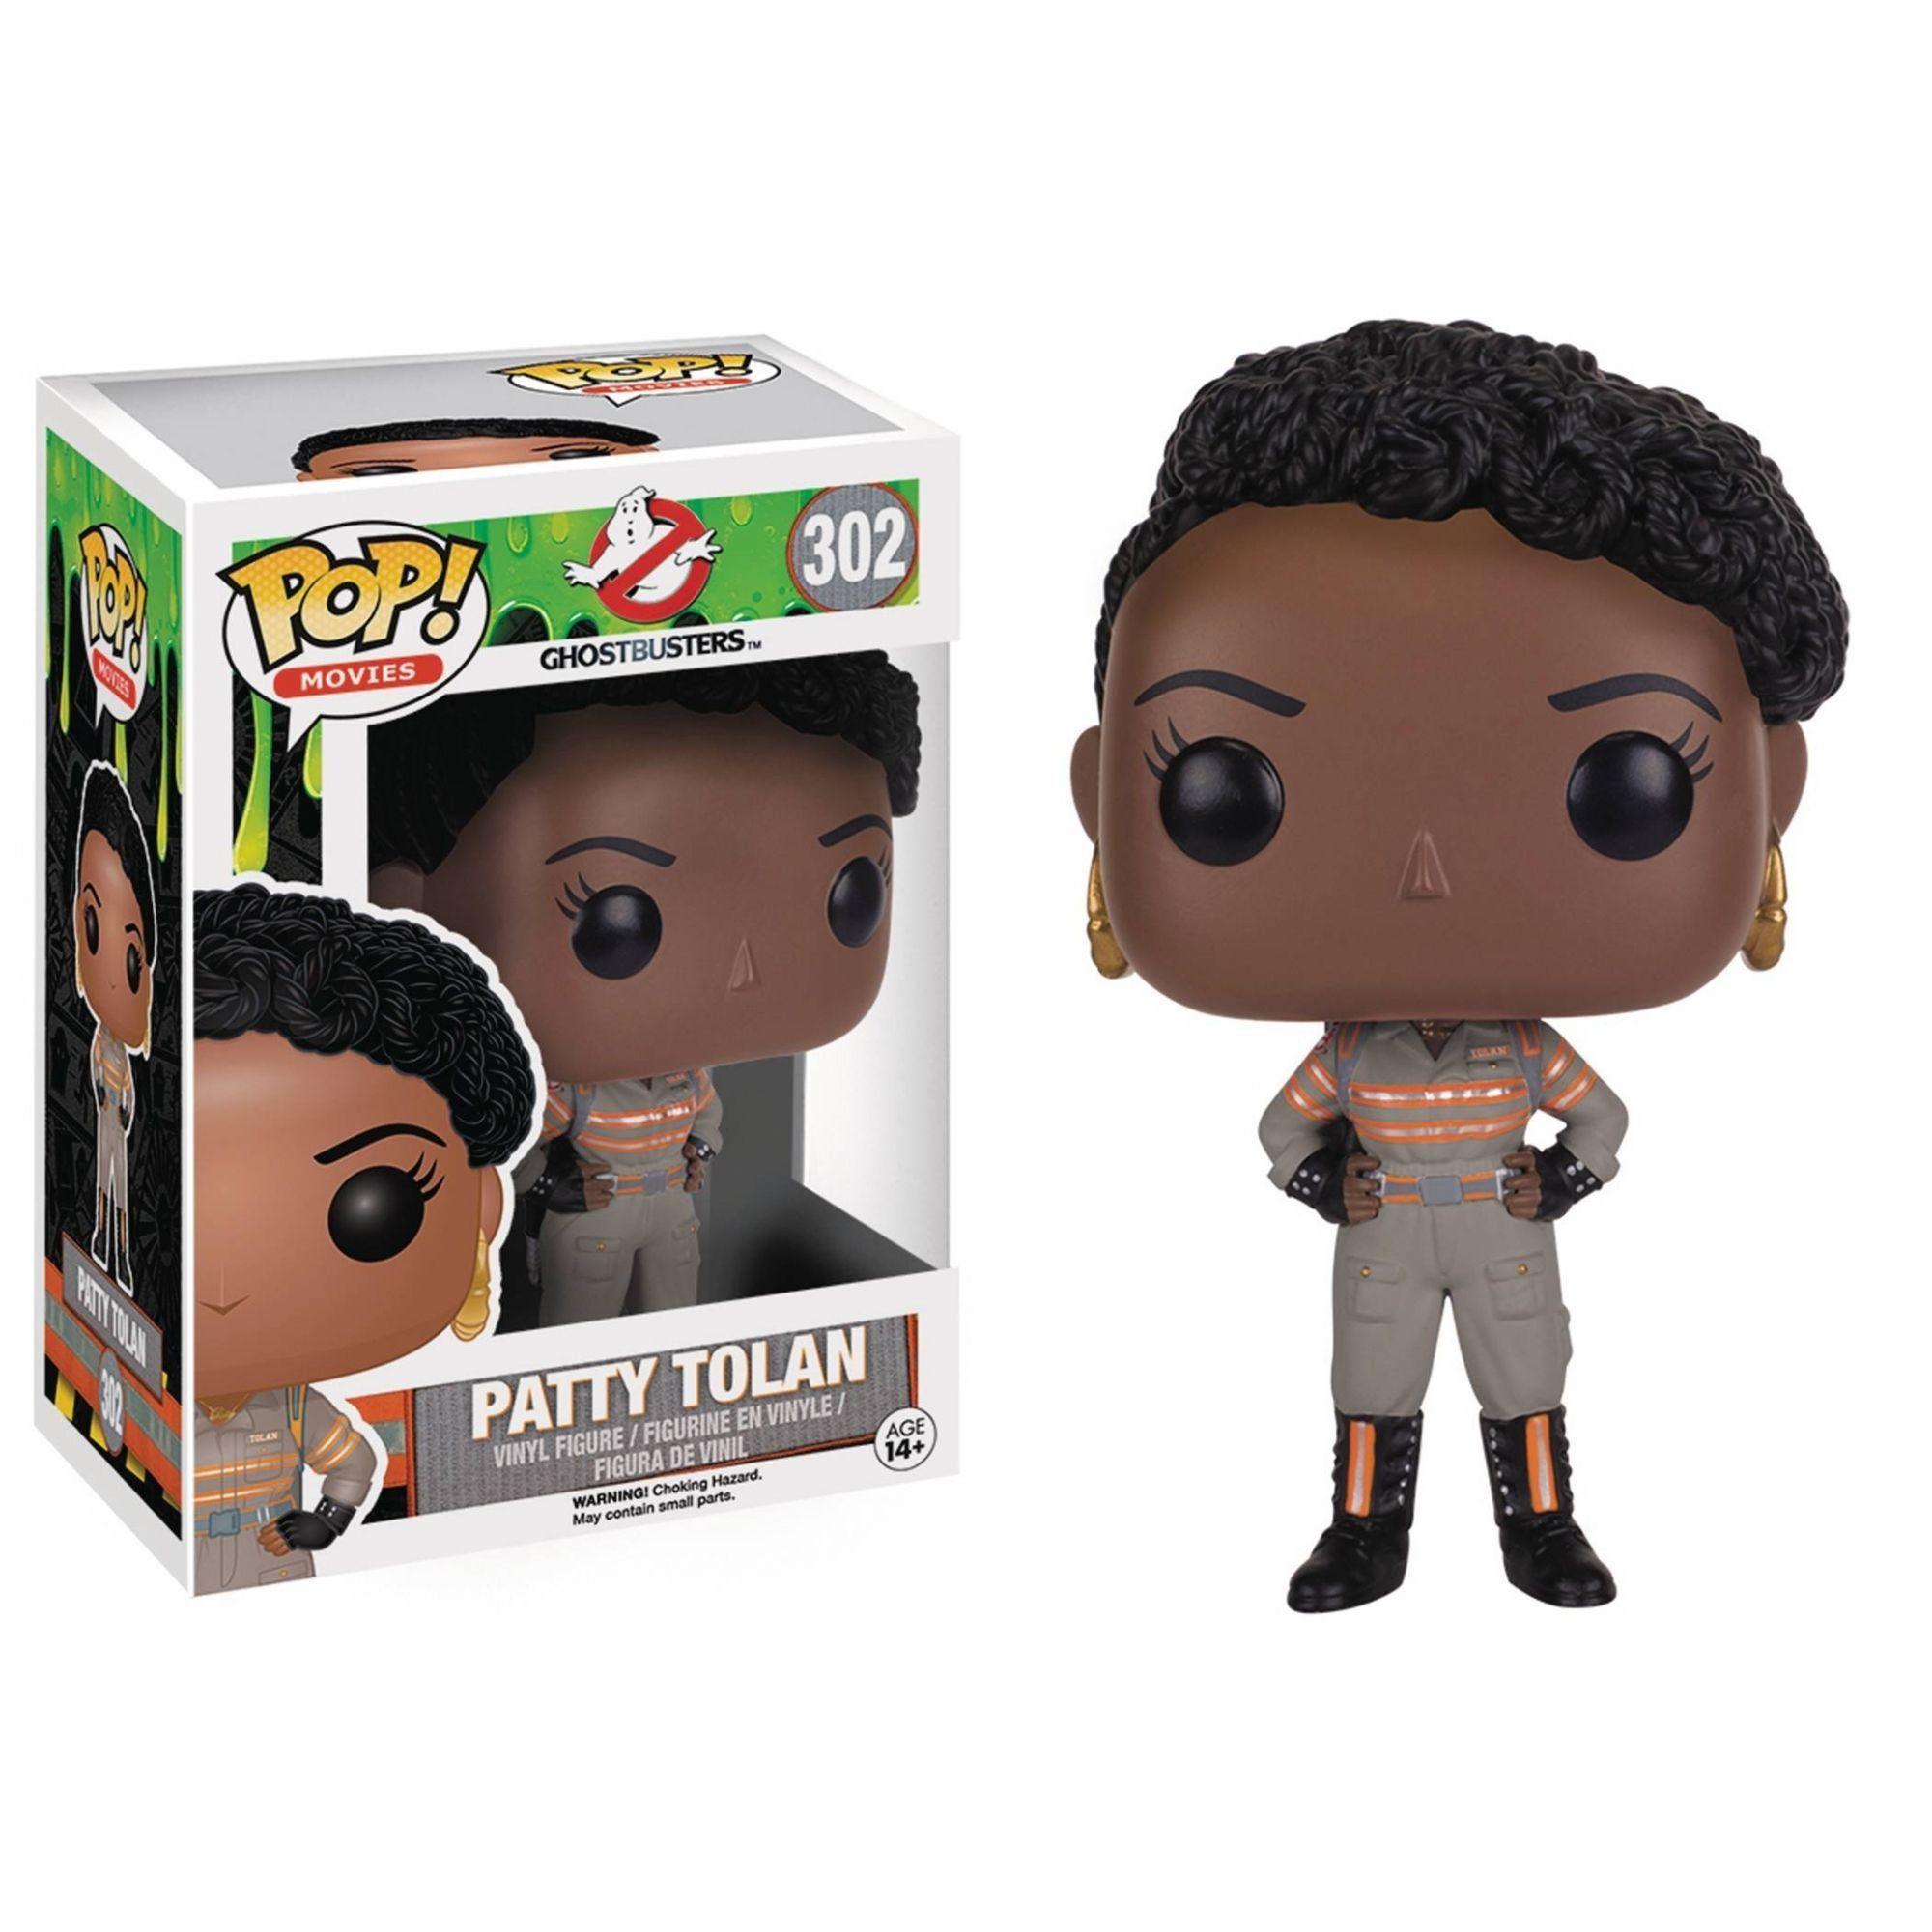 Funko Pop! Ghostbusters Patty Tolan #302 - Funko